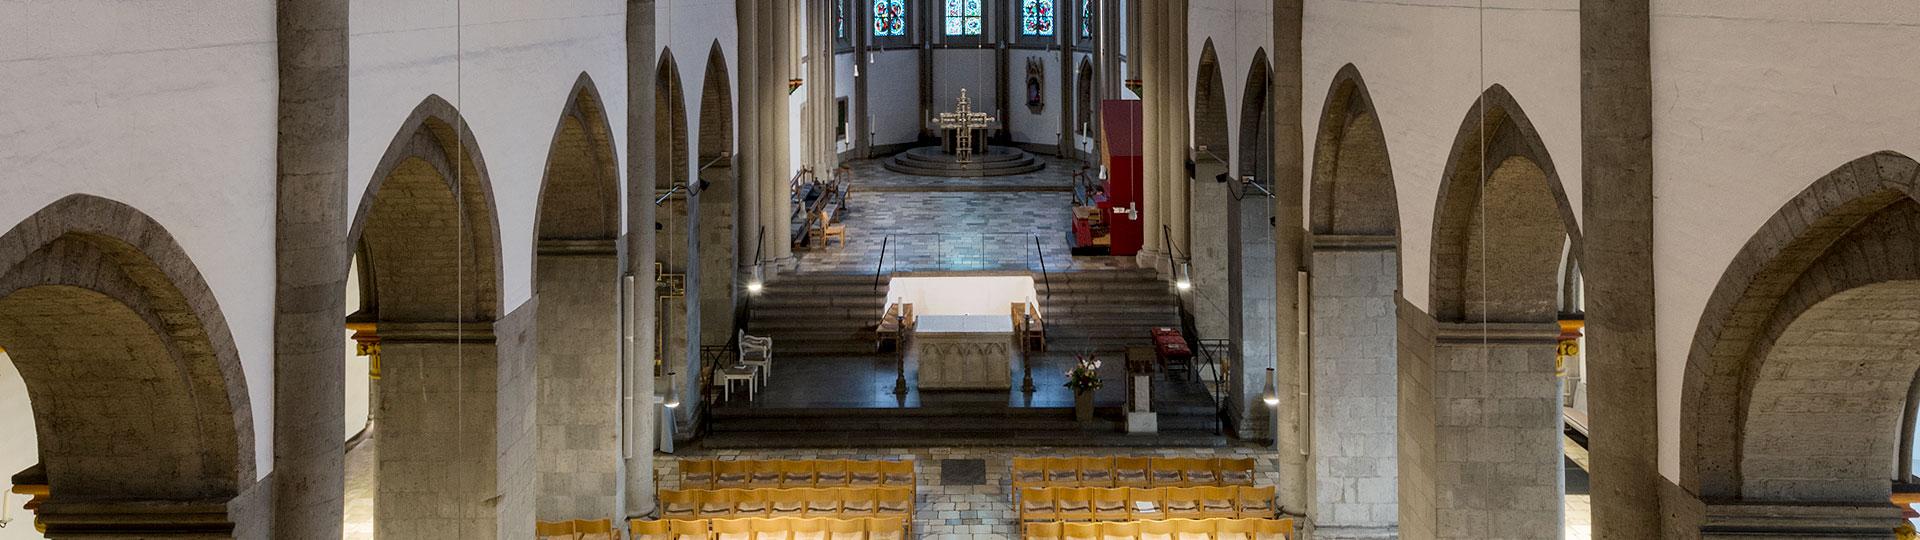 Foto Münster St. Vitus innen